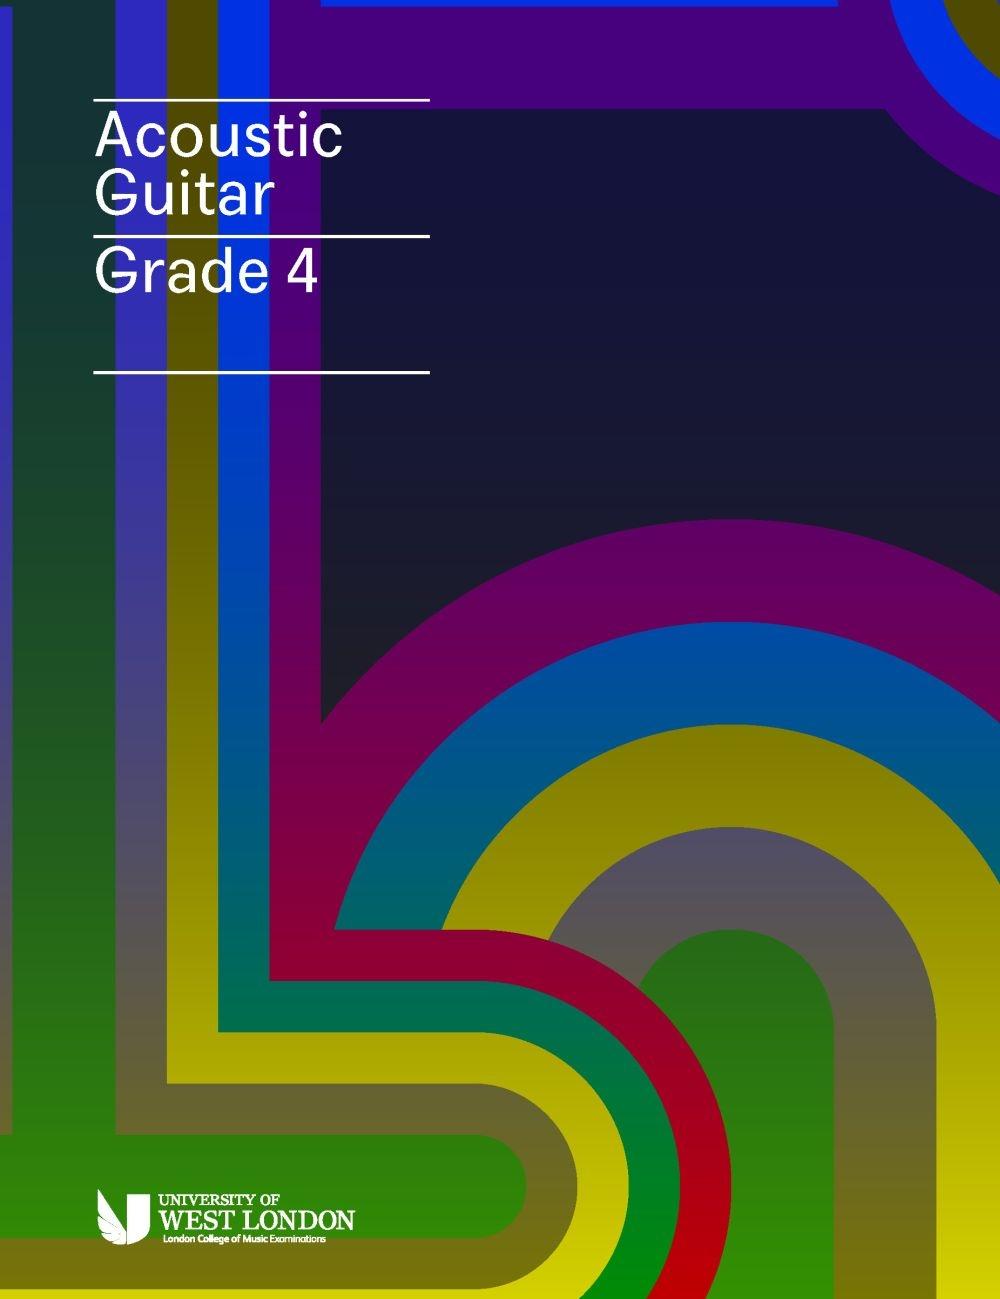 LCM Acoustic Guitar Handbook Grade 4 2020: Acoustic Guitar: Instrumental Tutor